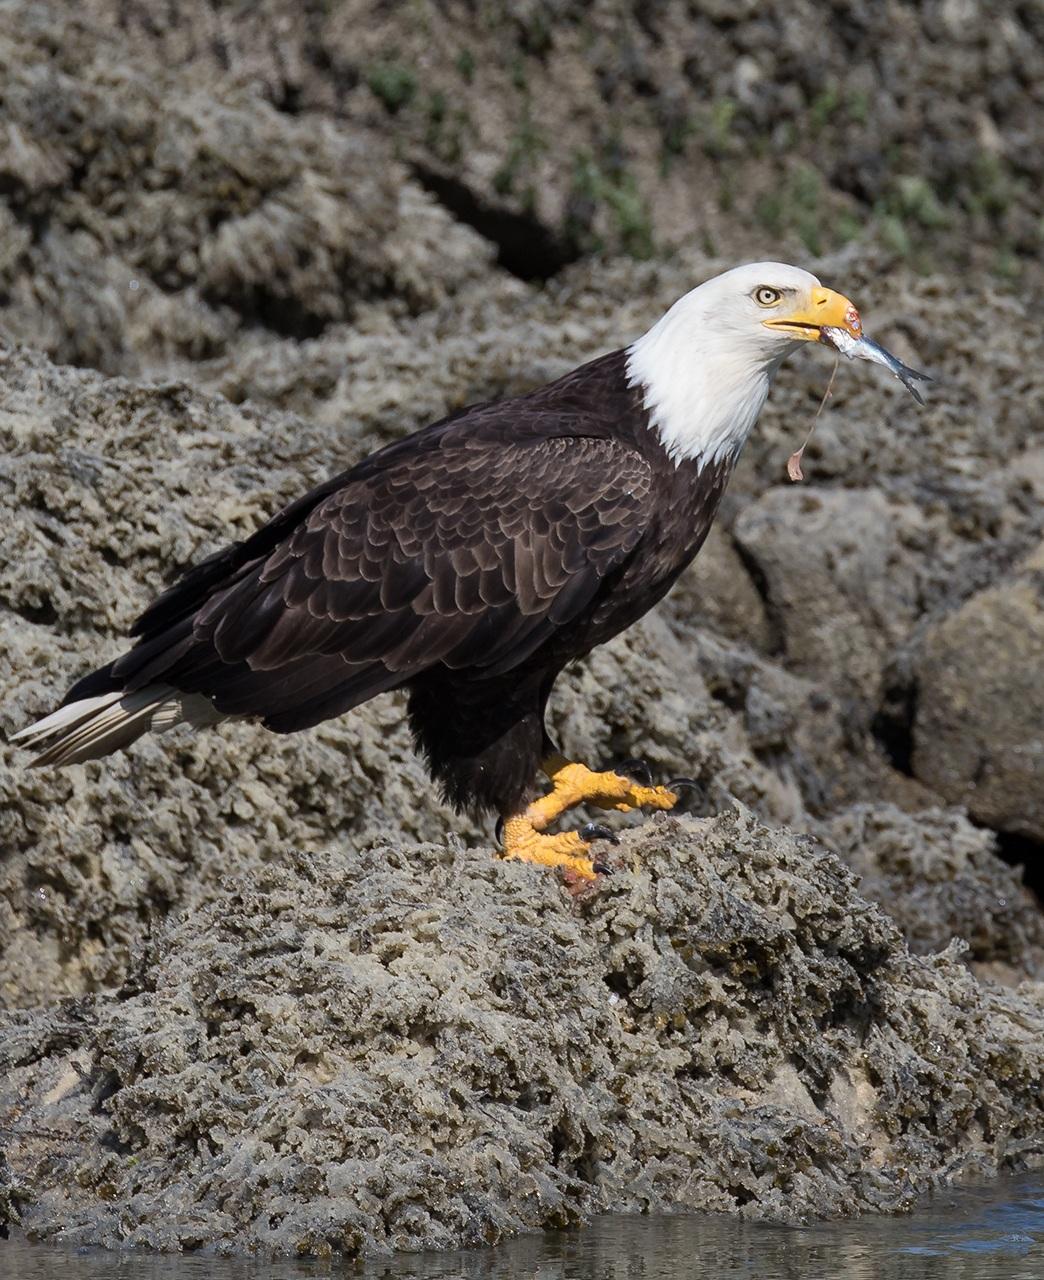 cc-eagle.jpg